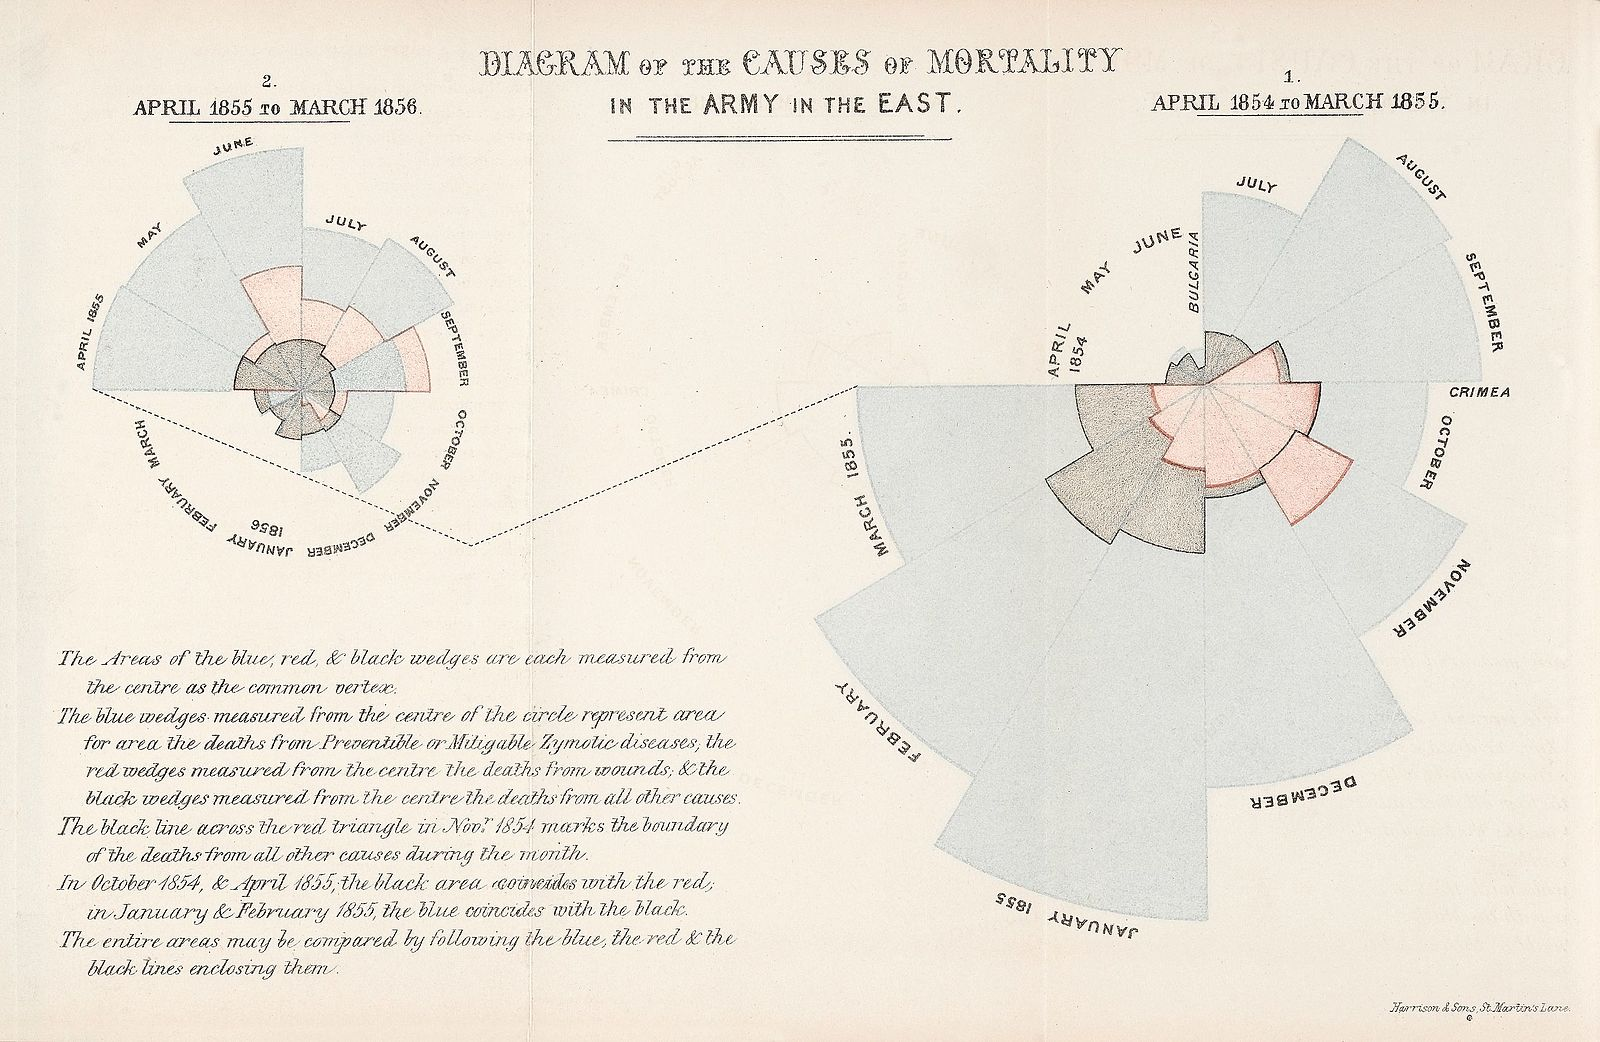 Florence Nightingale: Data Viz Pioneer [EPISODE]